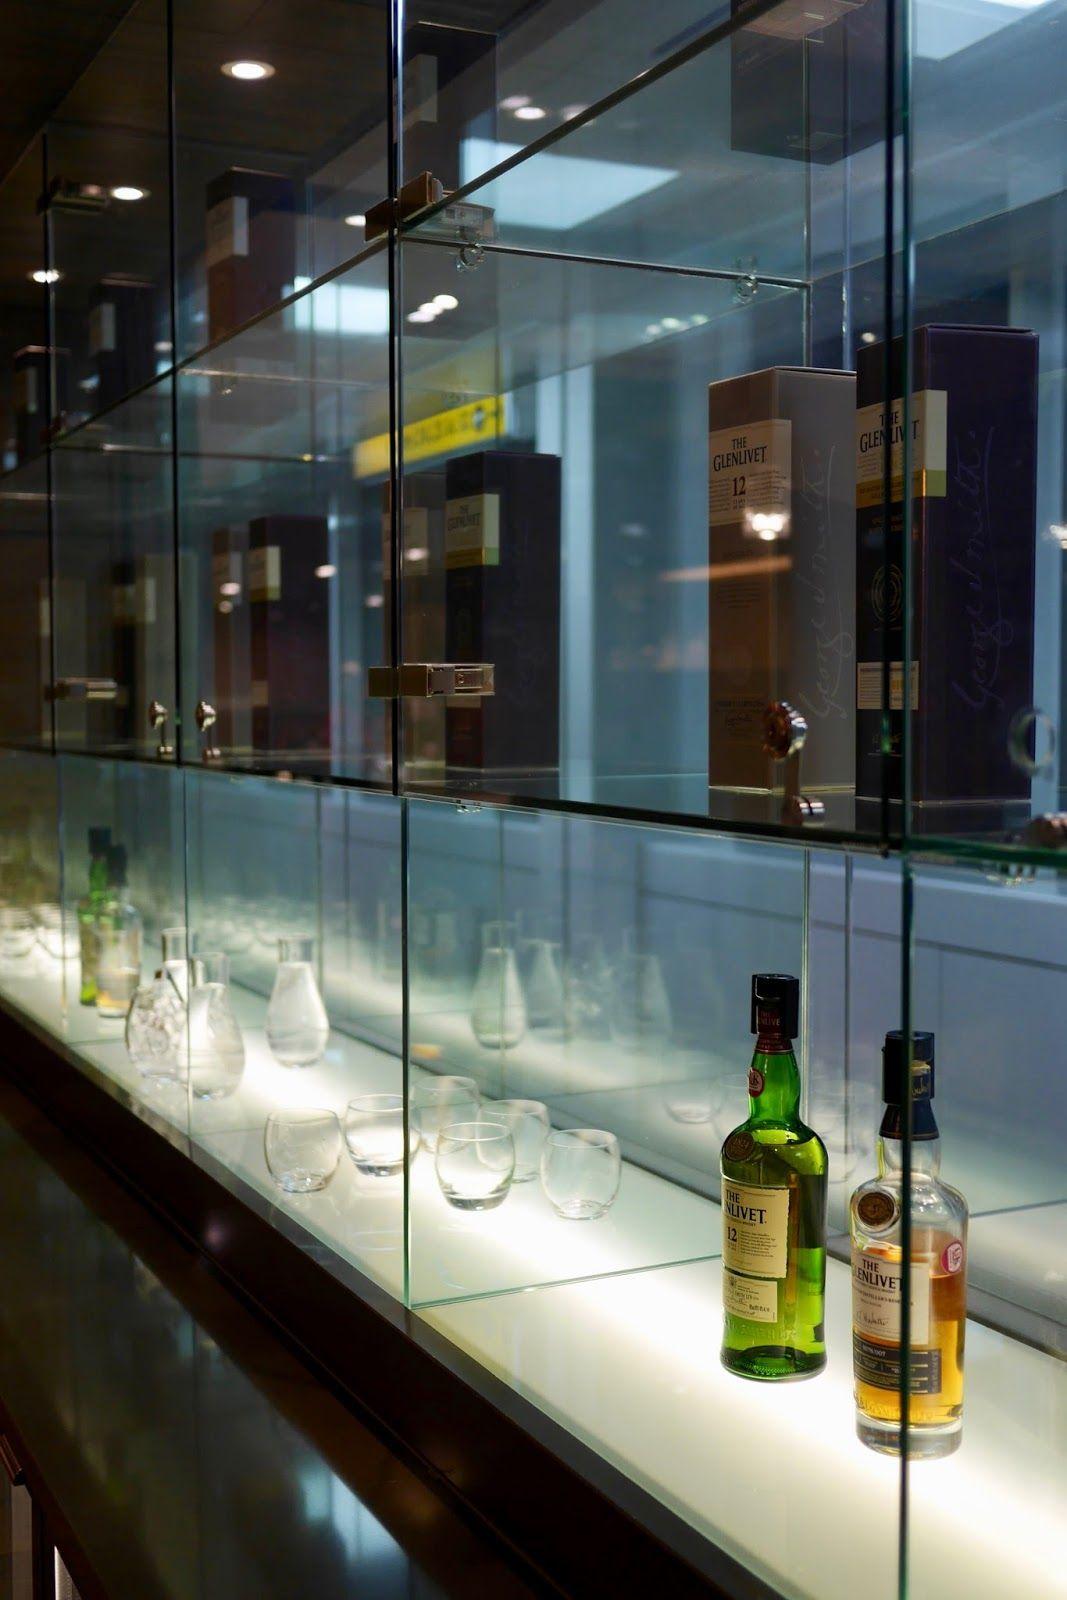 30 fuß vor hause design british airways lounge at glasgow airport ft glenlivet whisky snug